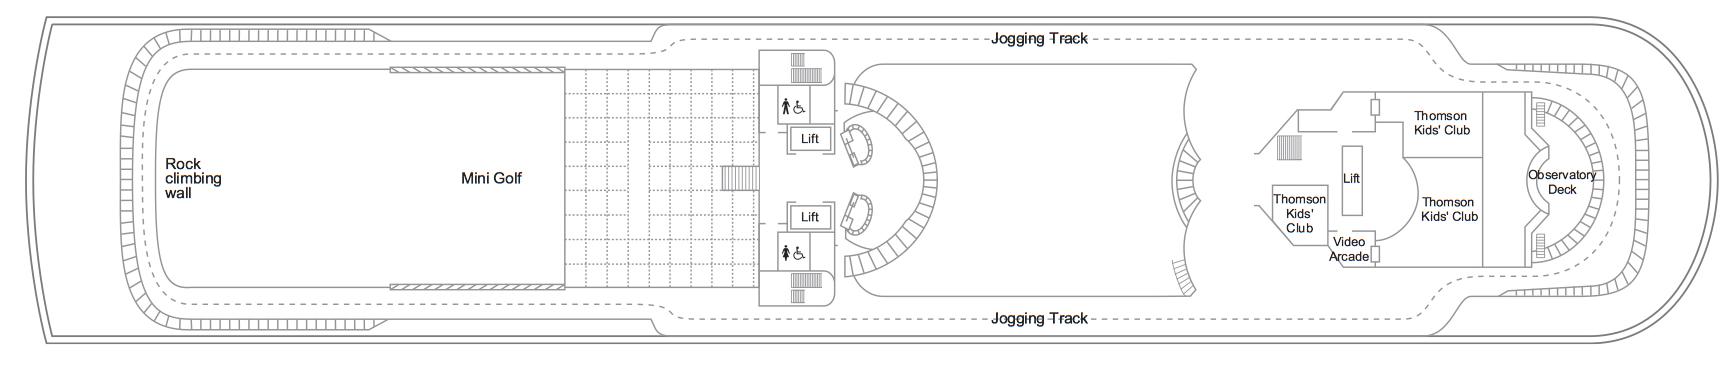 Thomson Cruise Thomson Discovery Deck Plans Deck 10.jpg